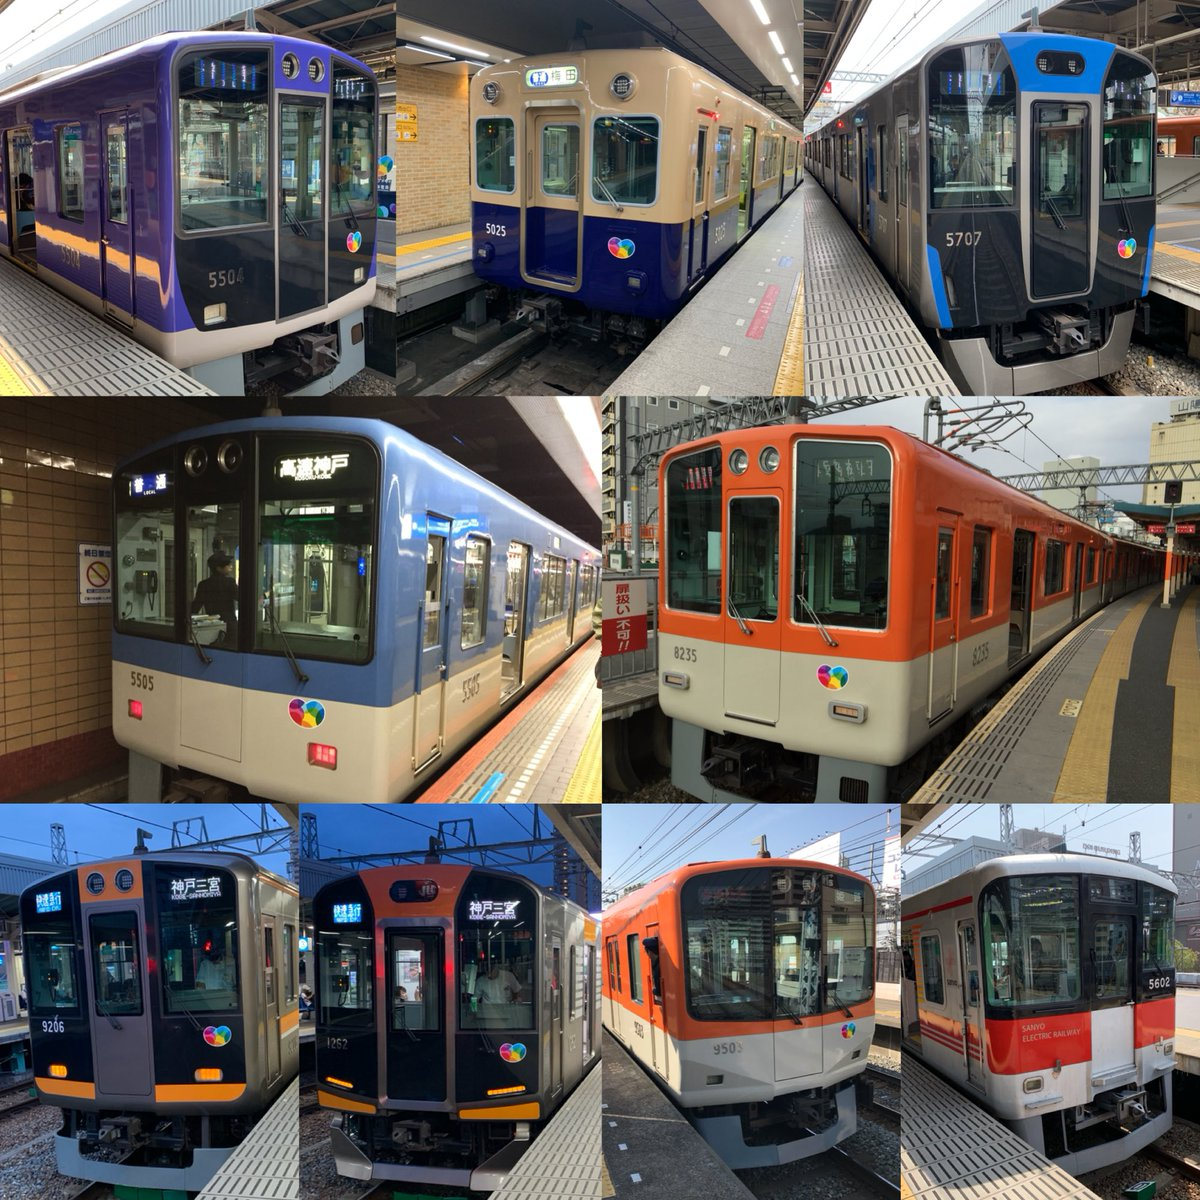 test ツイッターメディア - 阪神電車コレクション #阪神電車 #コレクション https://t.co/IVj3SmLAuU